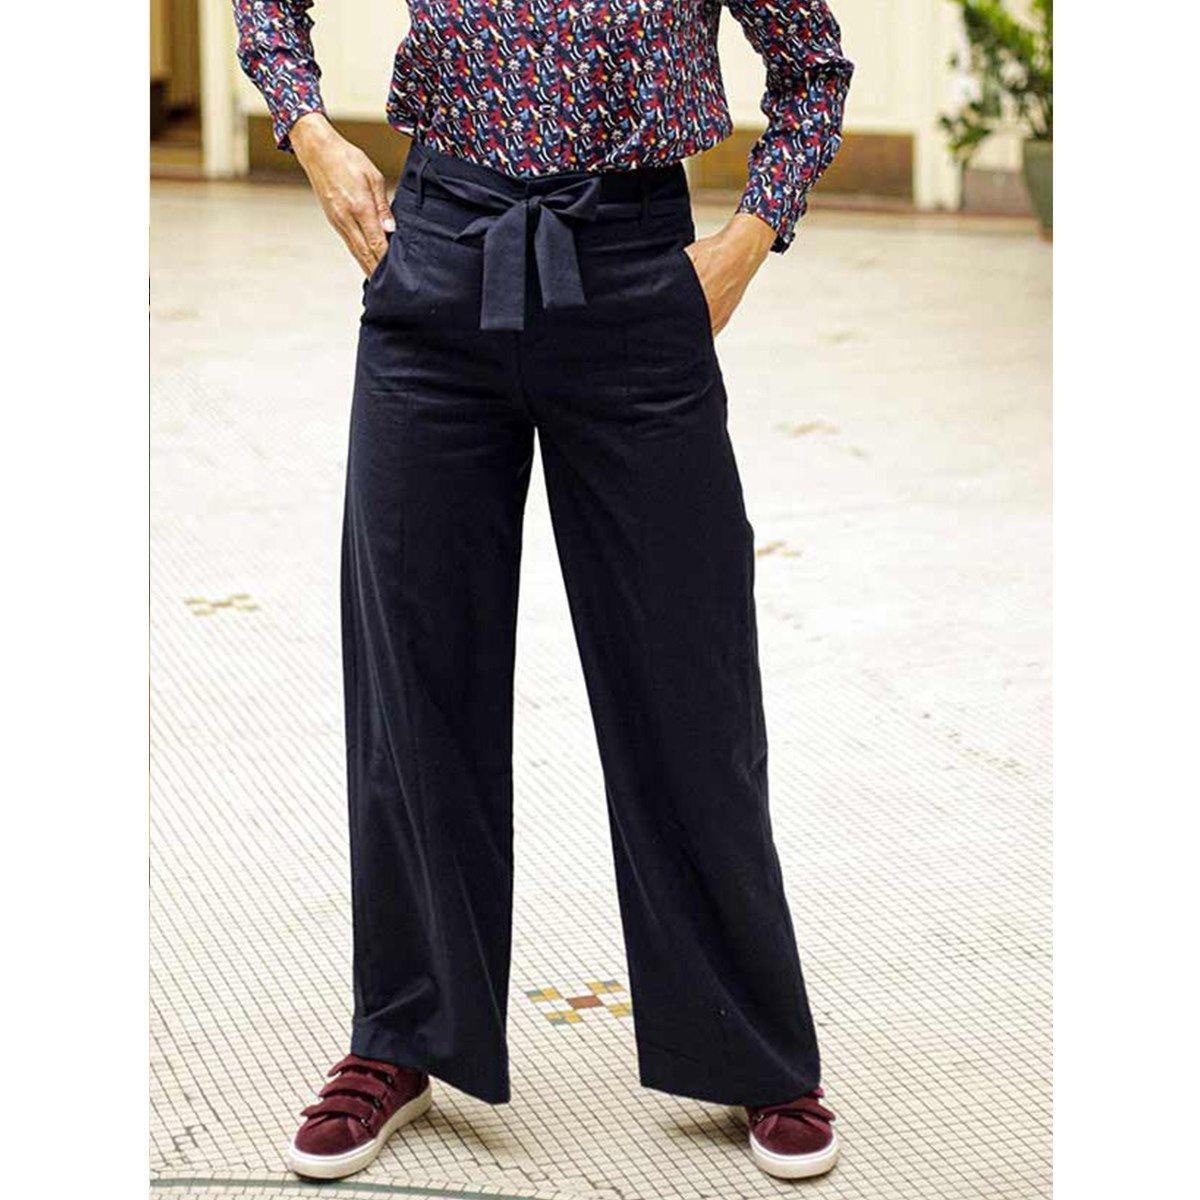 Pantalon 100% laine vierge ample